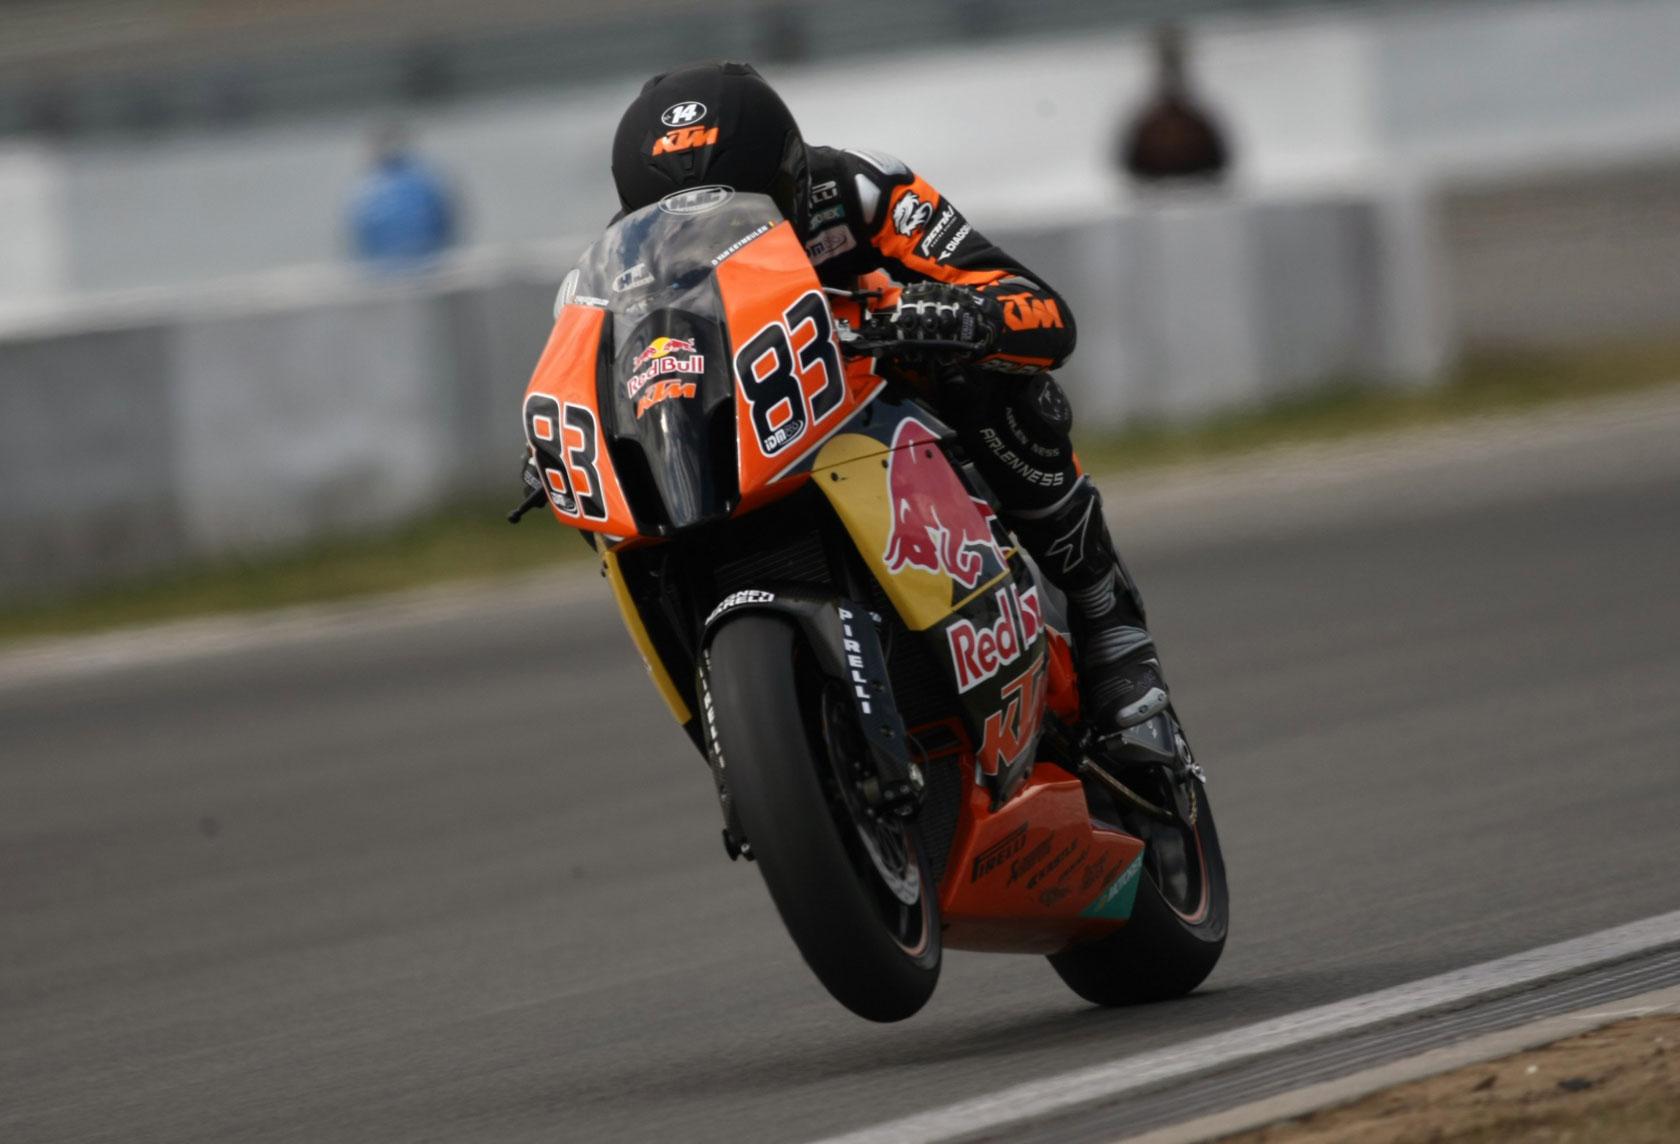 2010 KTM 1190 RC8R Red Bull wheelie wallpaper 1680x1144 93190 1680x1144